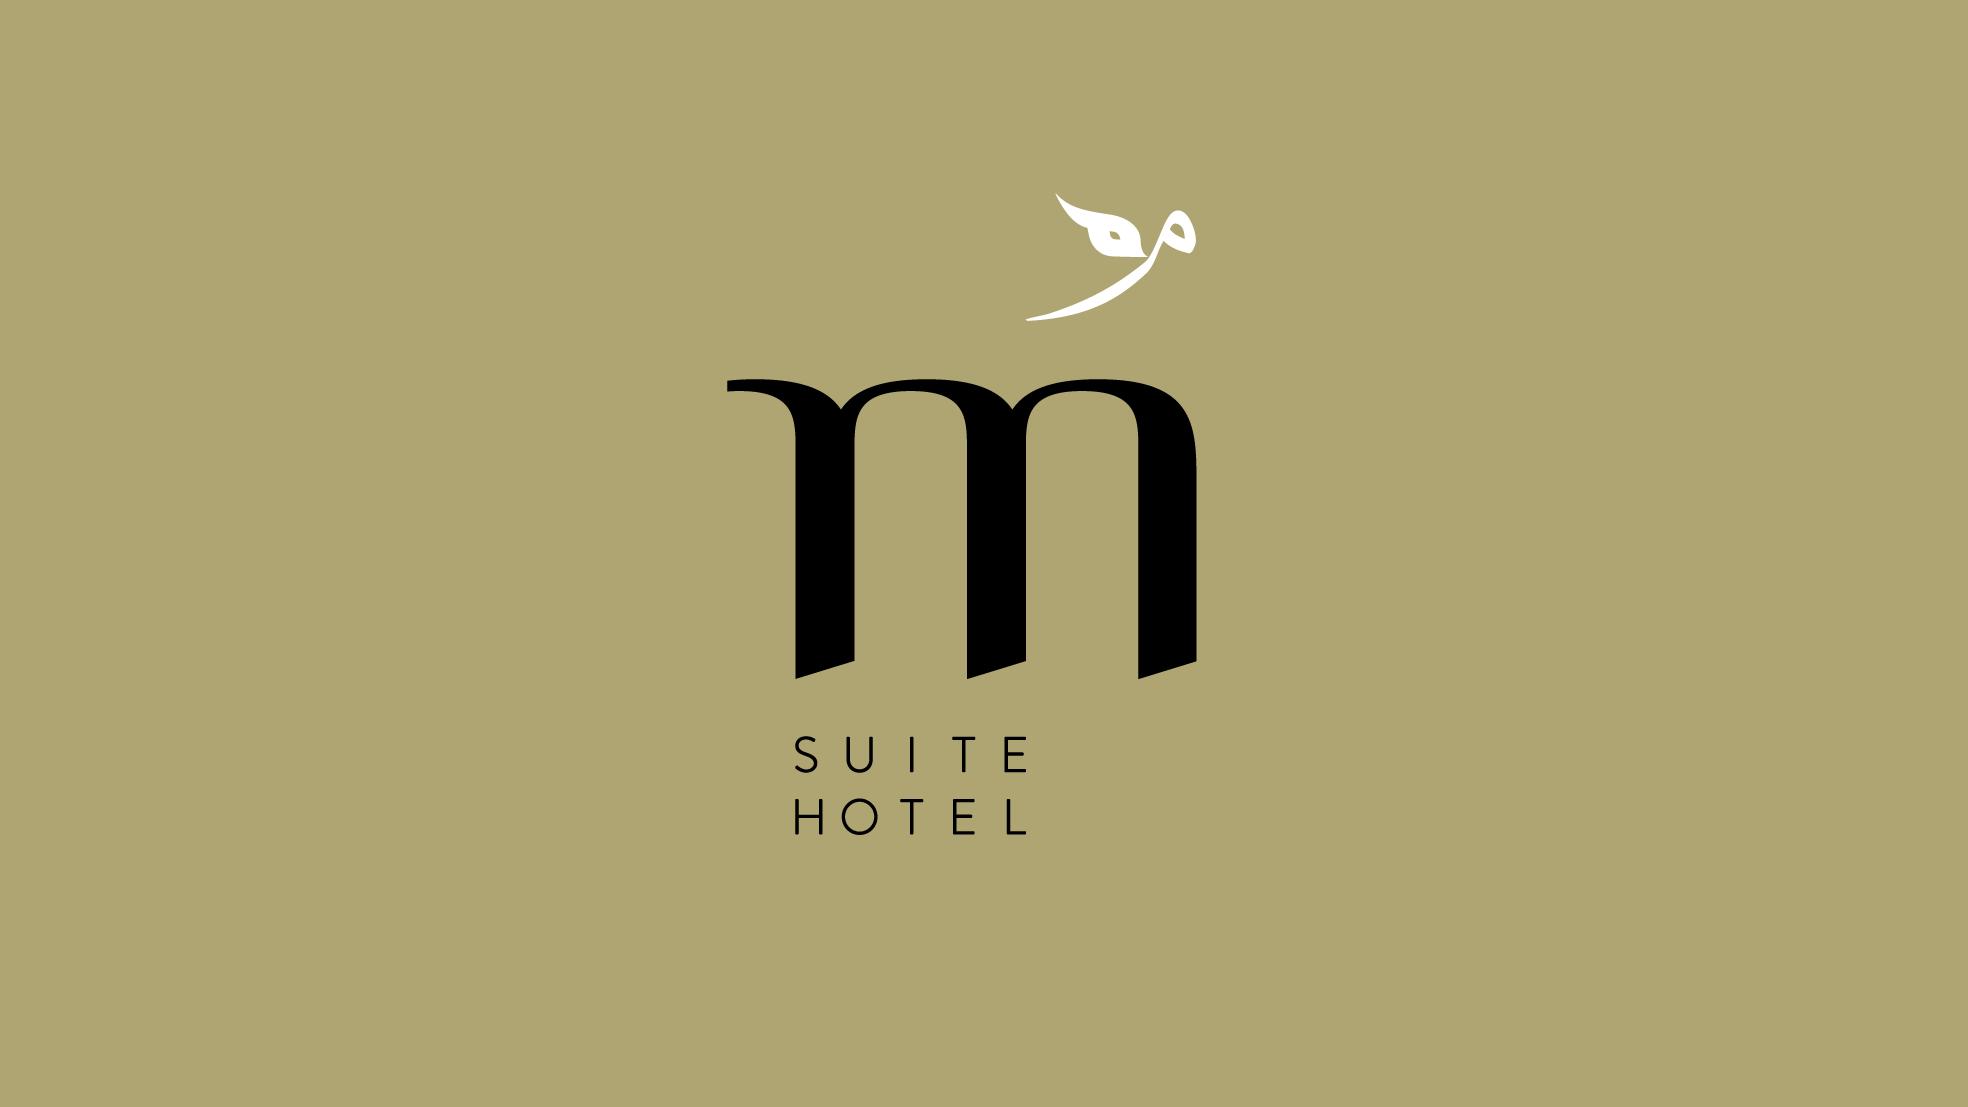 M Suite Hotel Branding & Concept